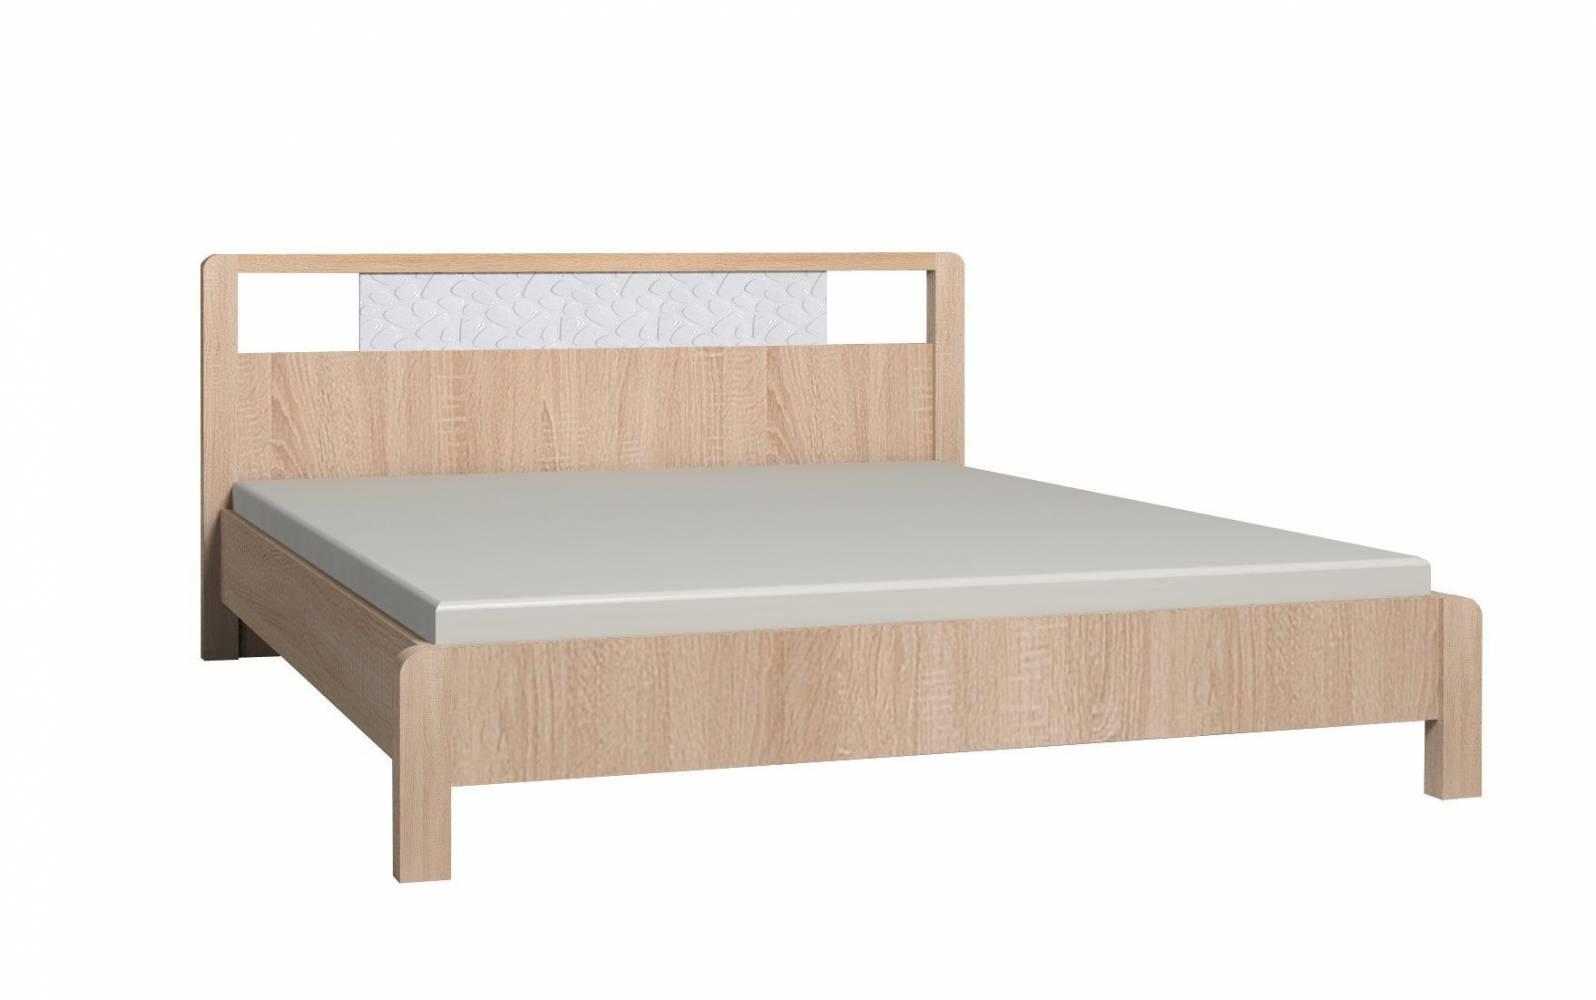 WYSPAA 41 Кровать 180, без основания, без матраса